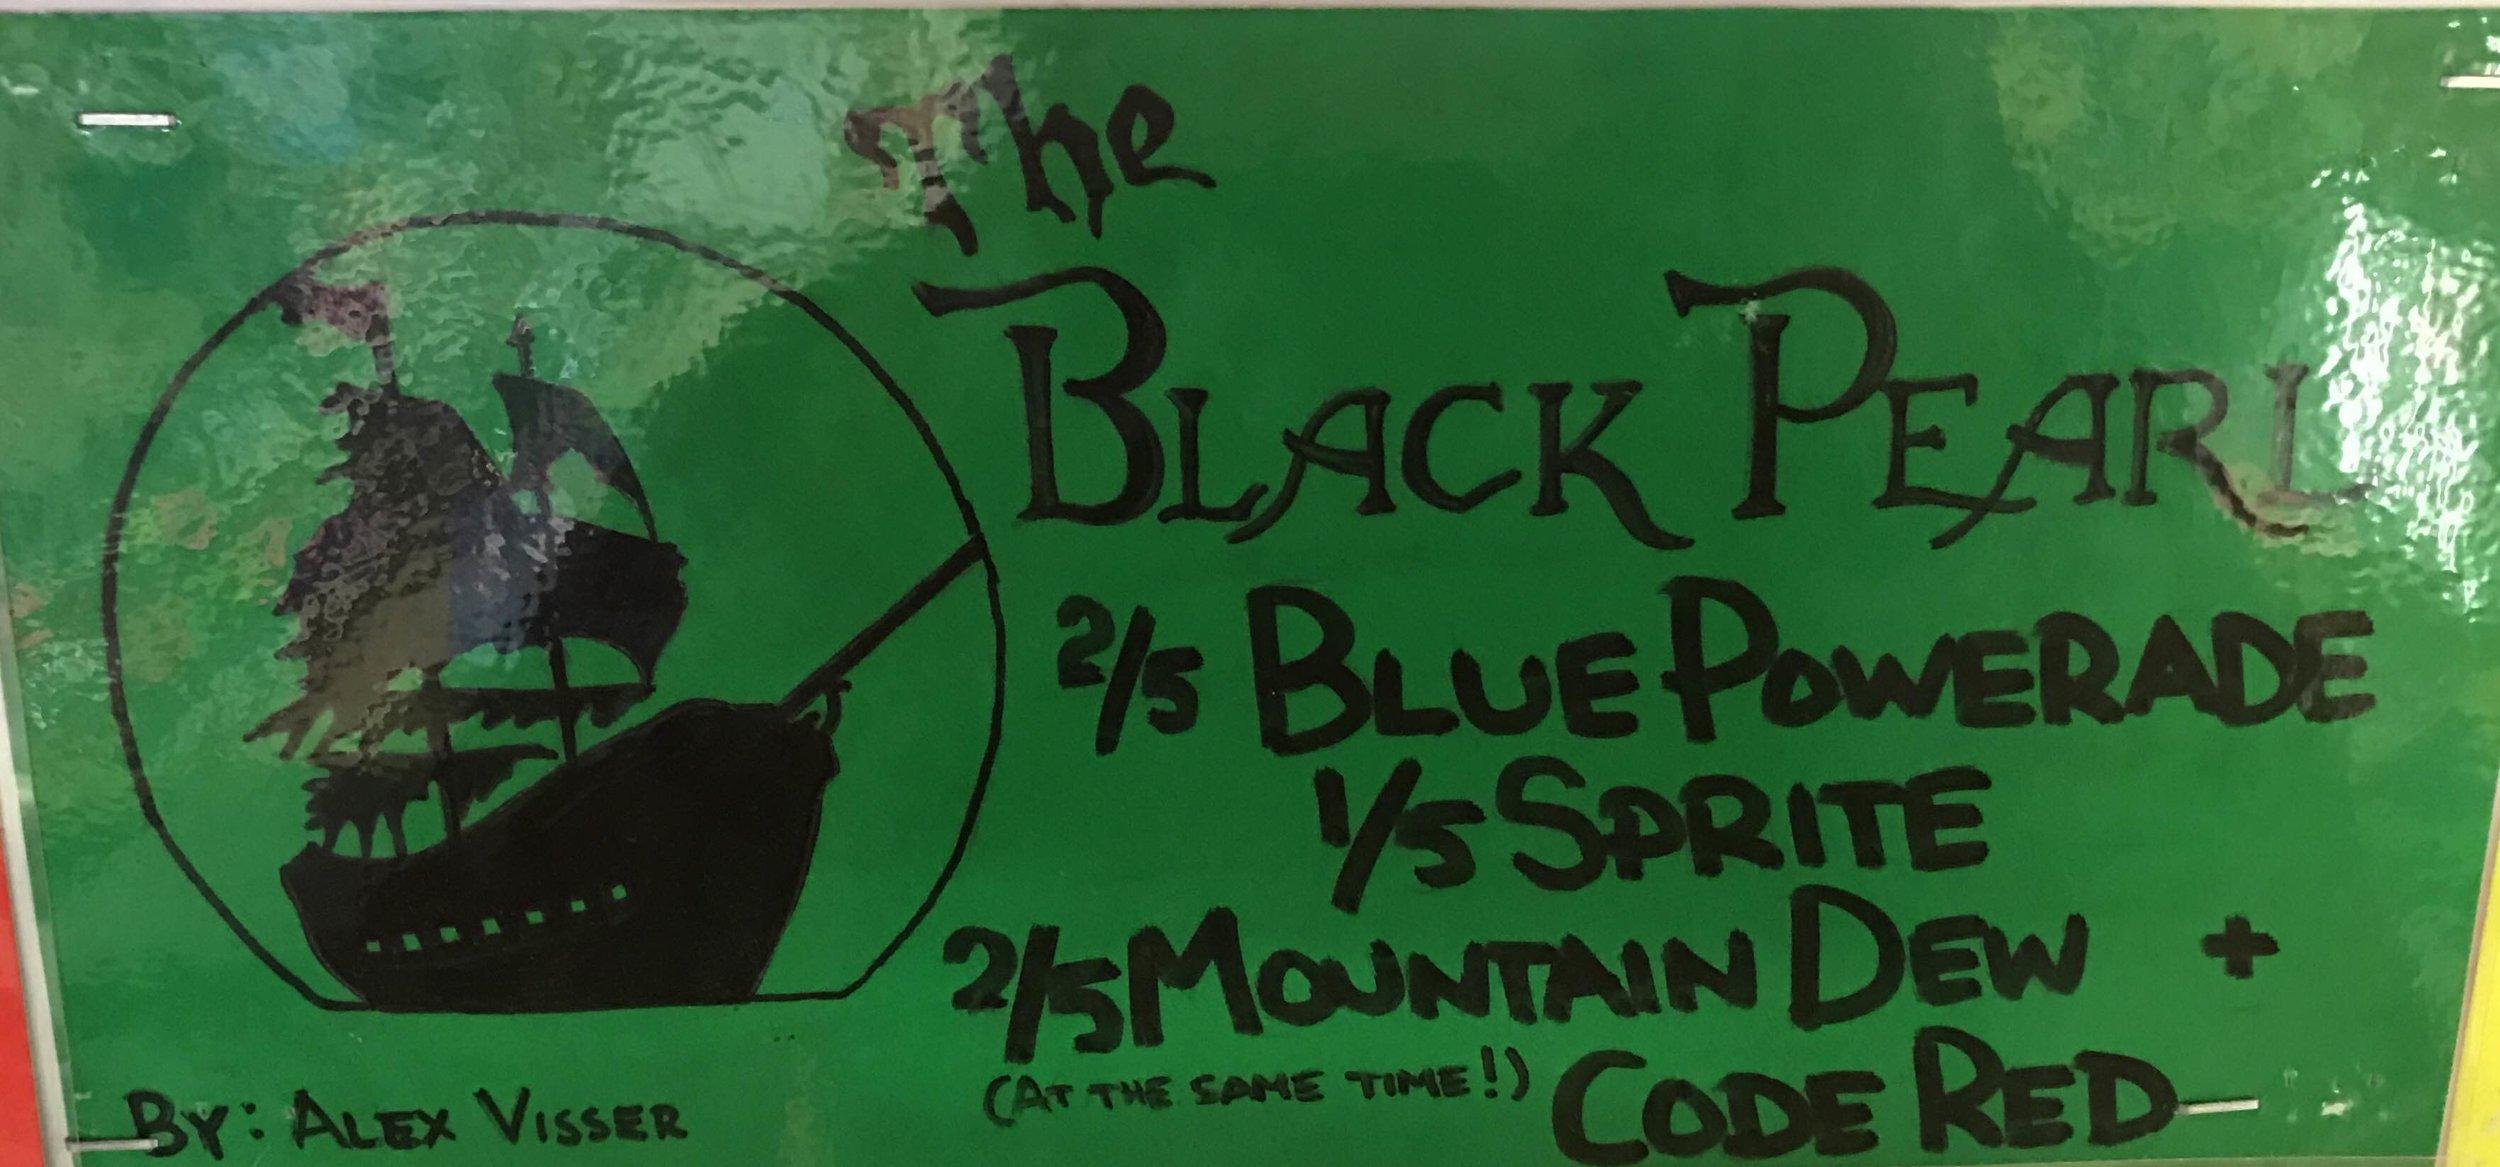 The Black Pearl.JPG